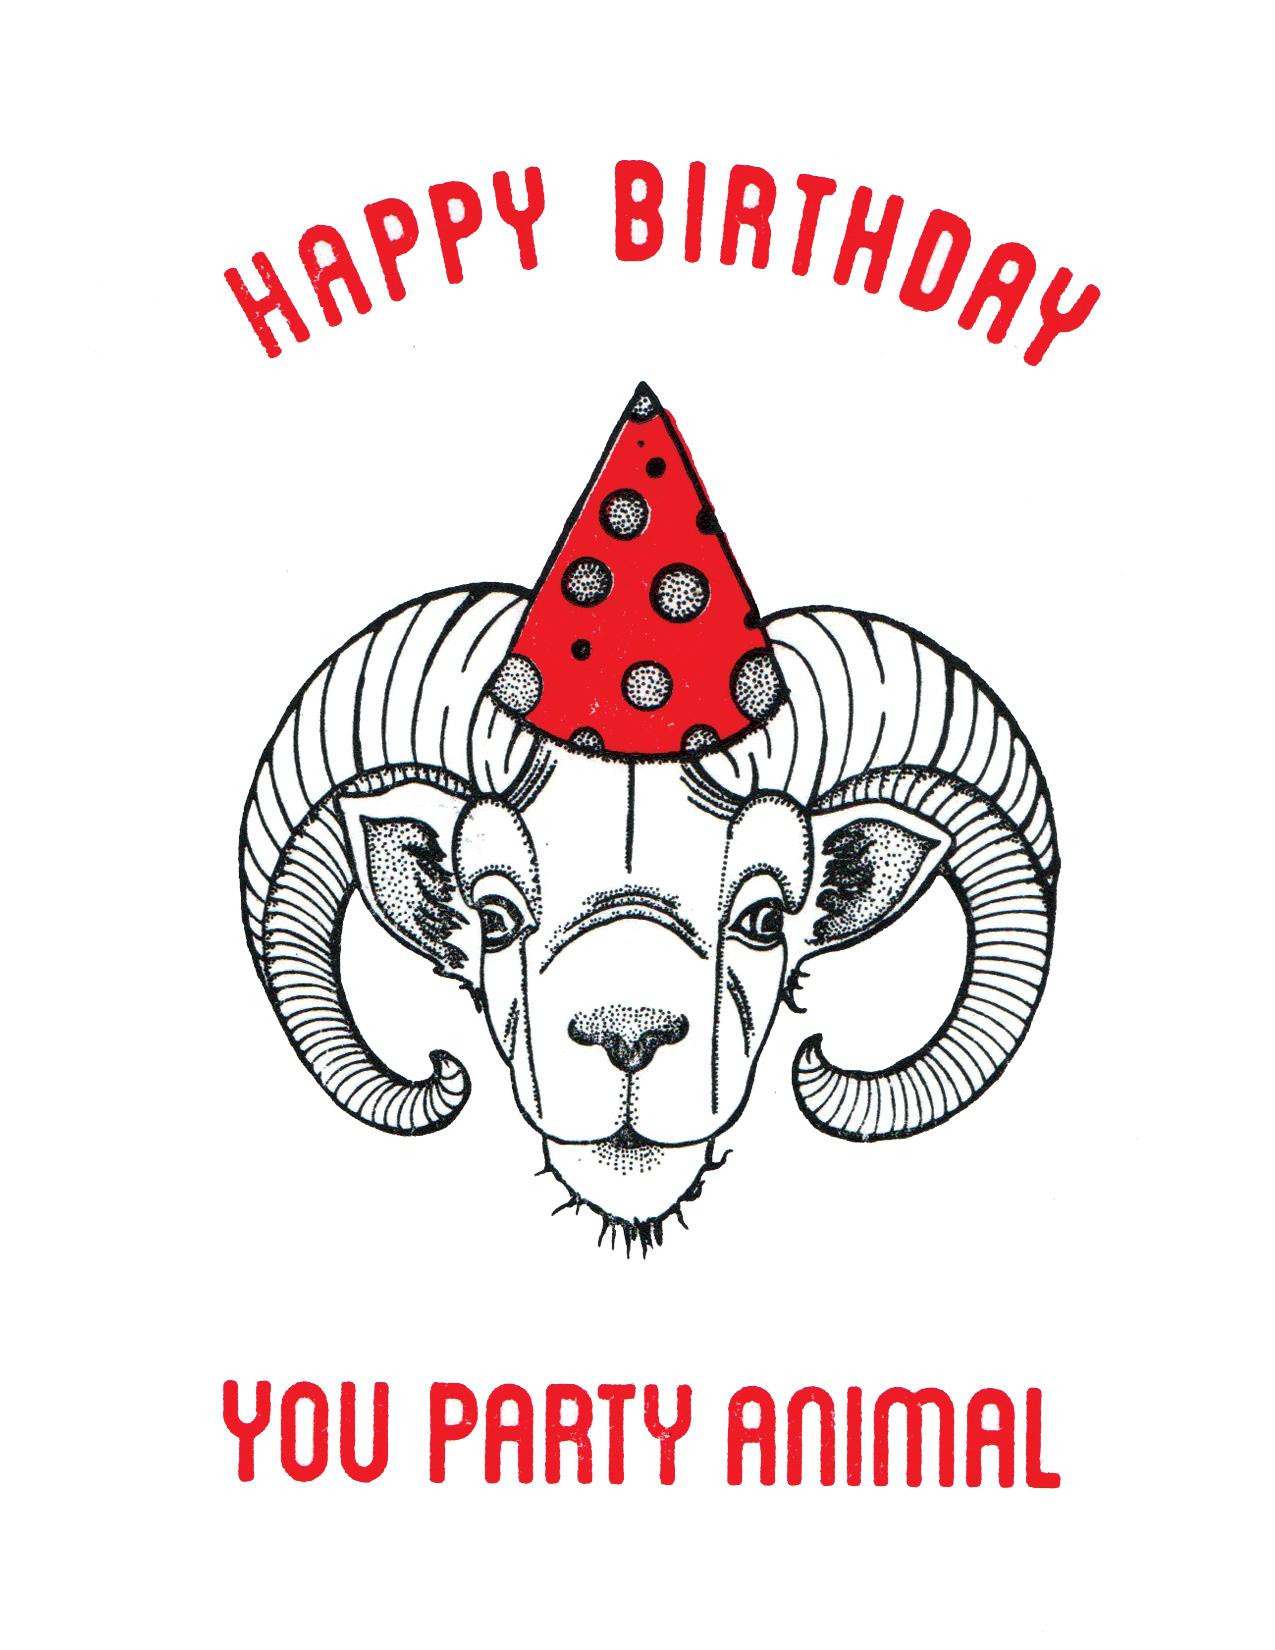 Party Animal - Print